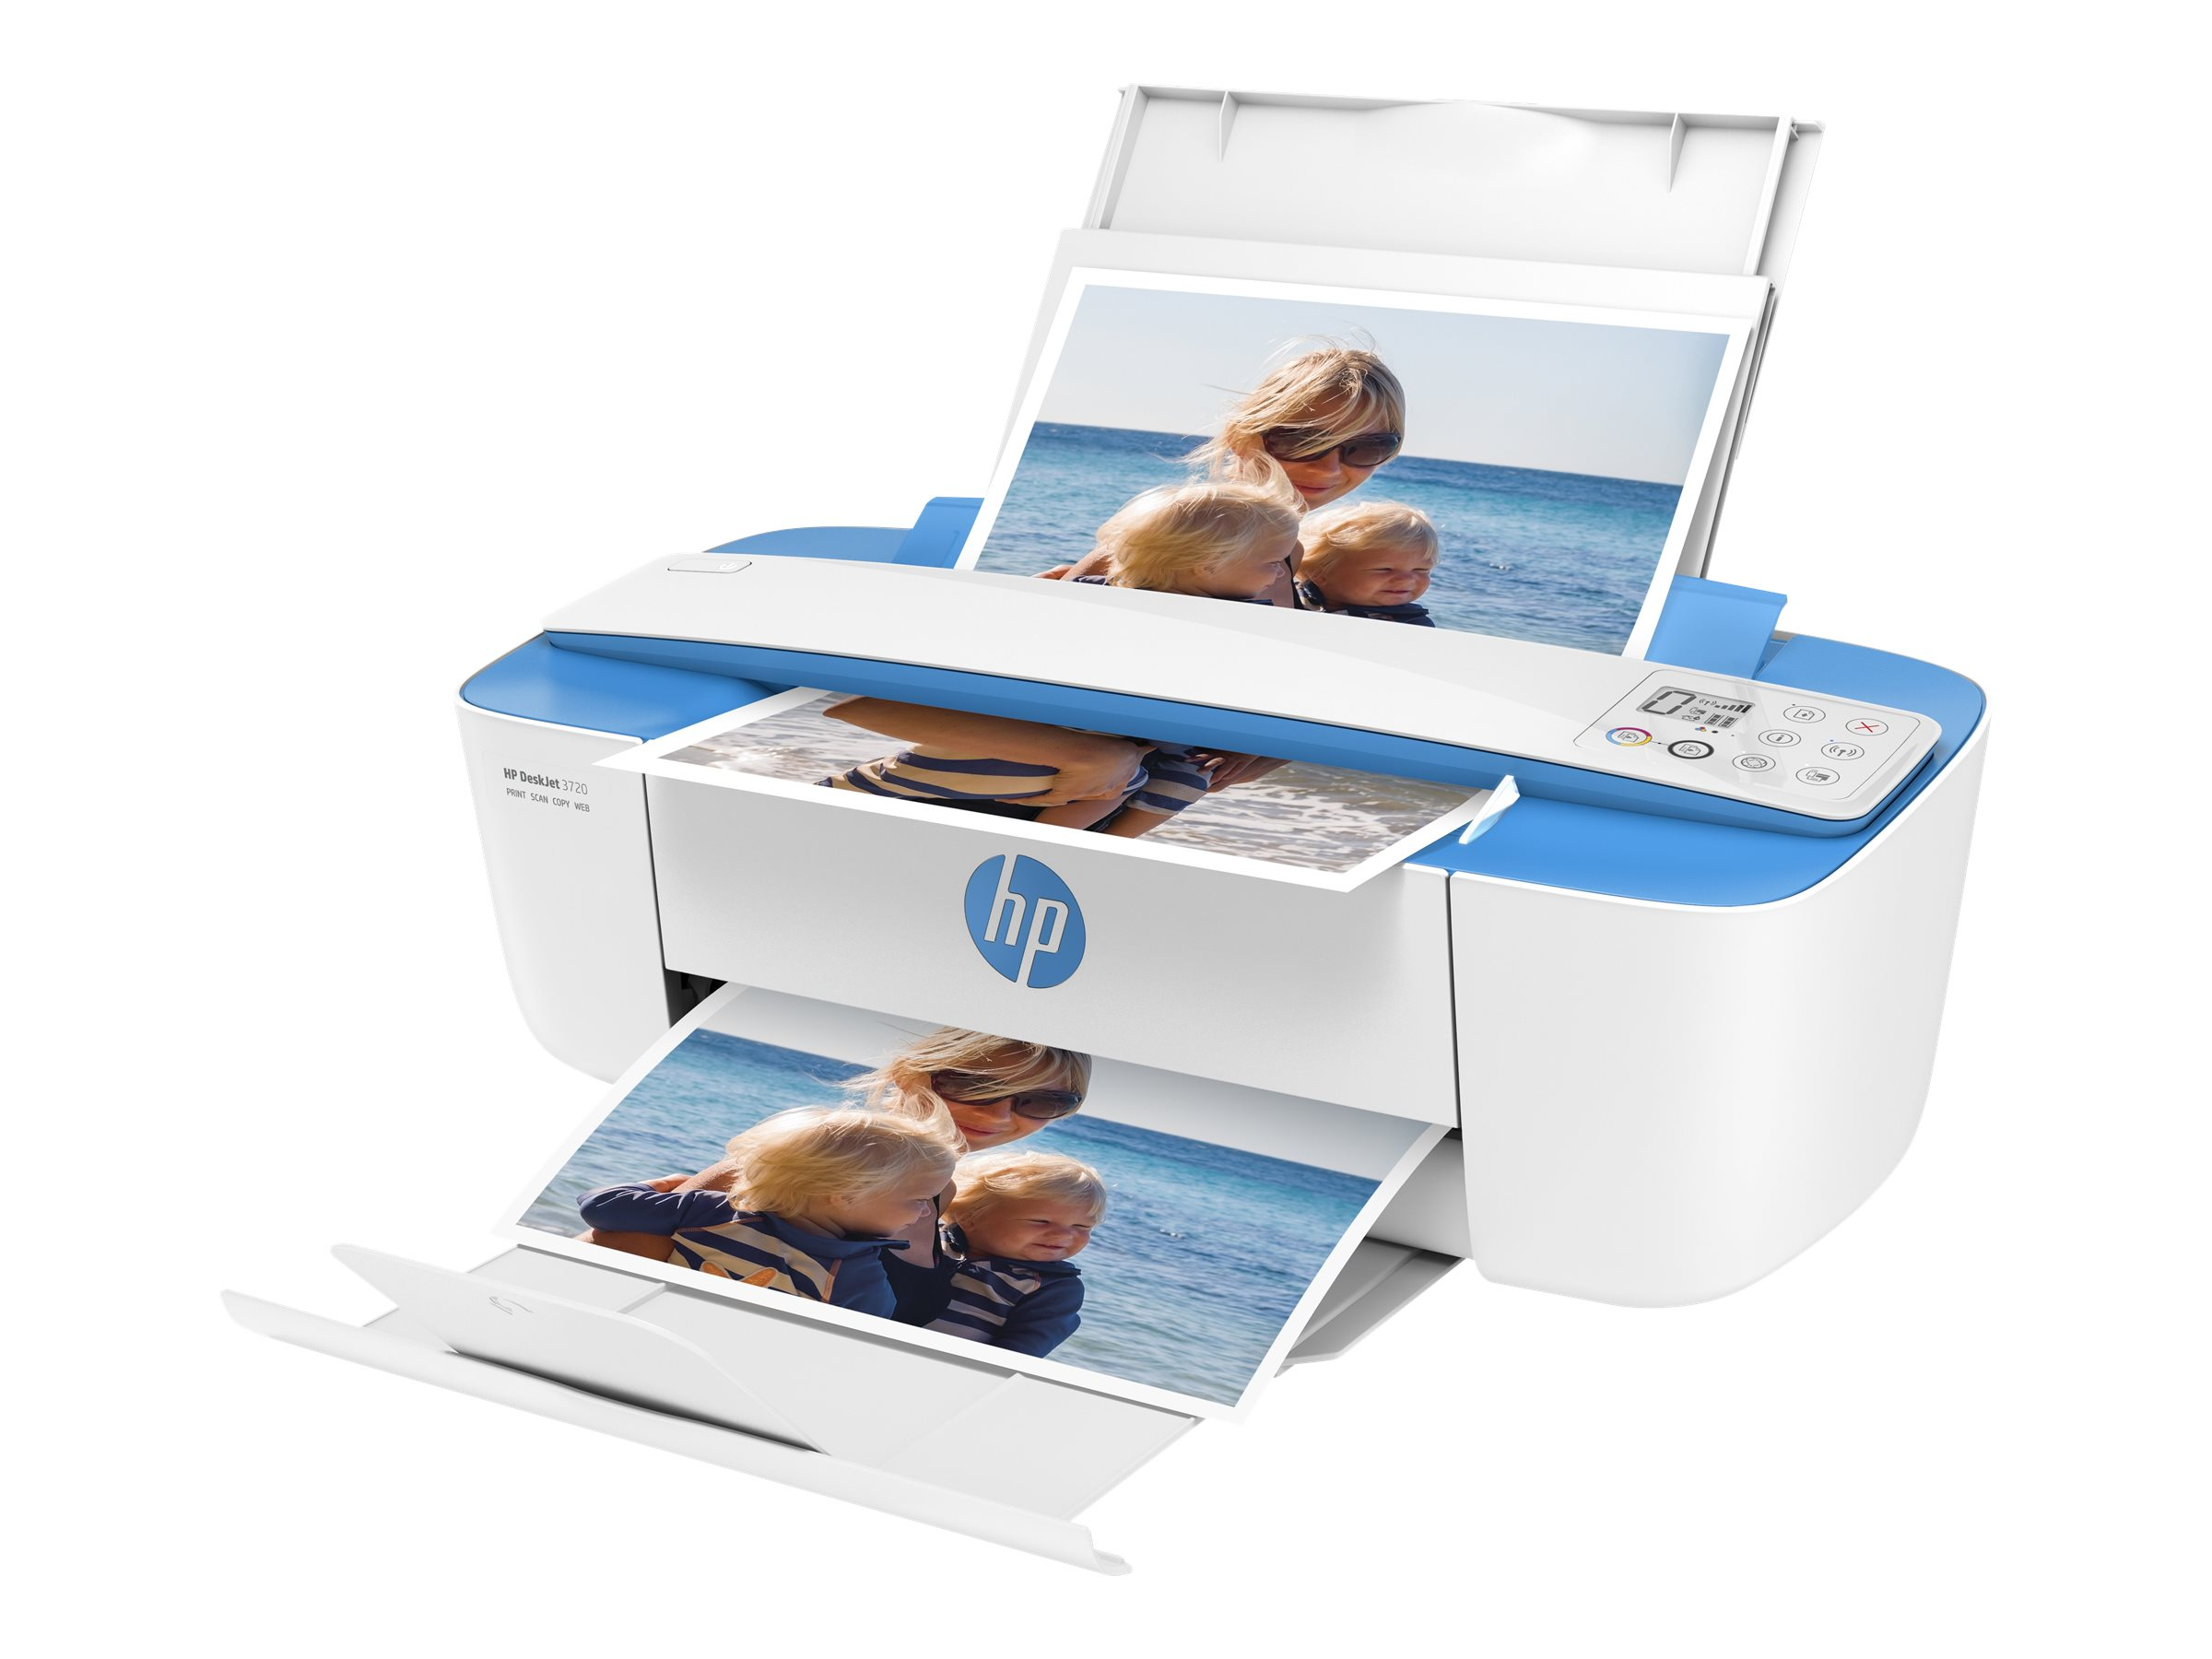 HP Deskjet 3750 All-in-One - Multifunktionsdrucker - Farbe - Tintenstrahl - 216 x 355 mm (Original) - A4/Legal (Medien)